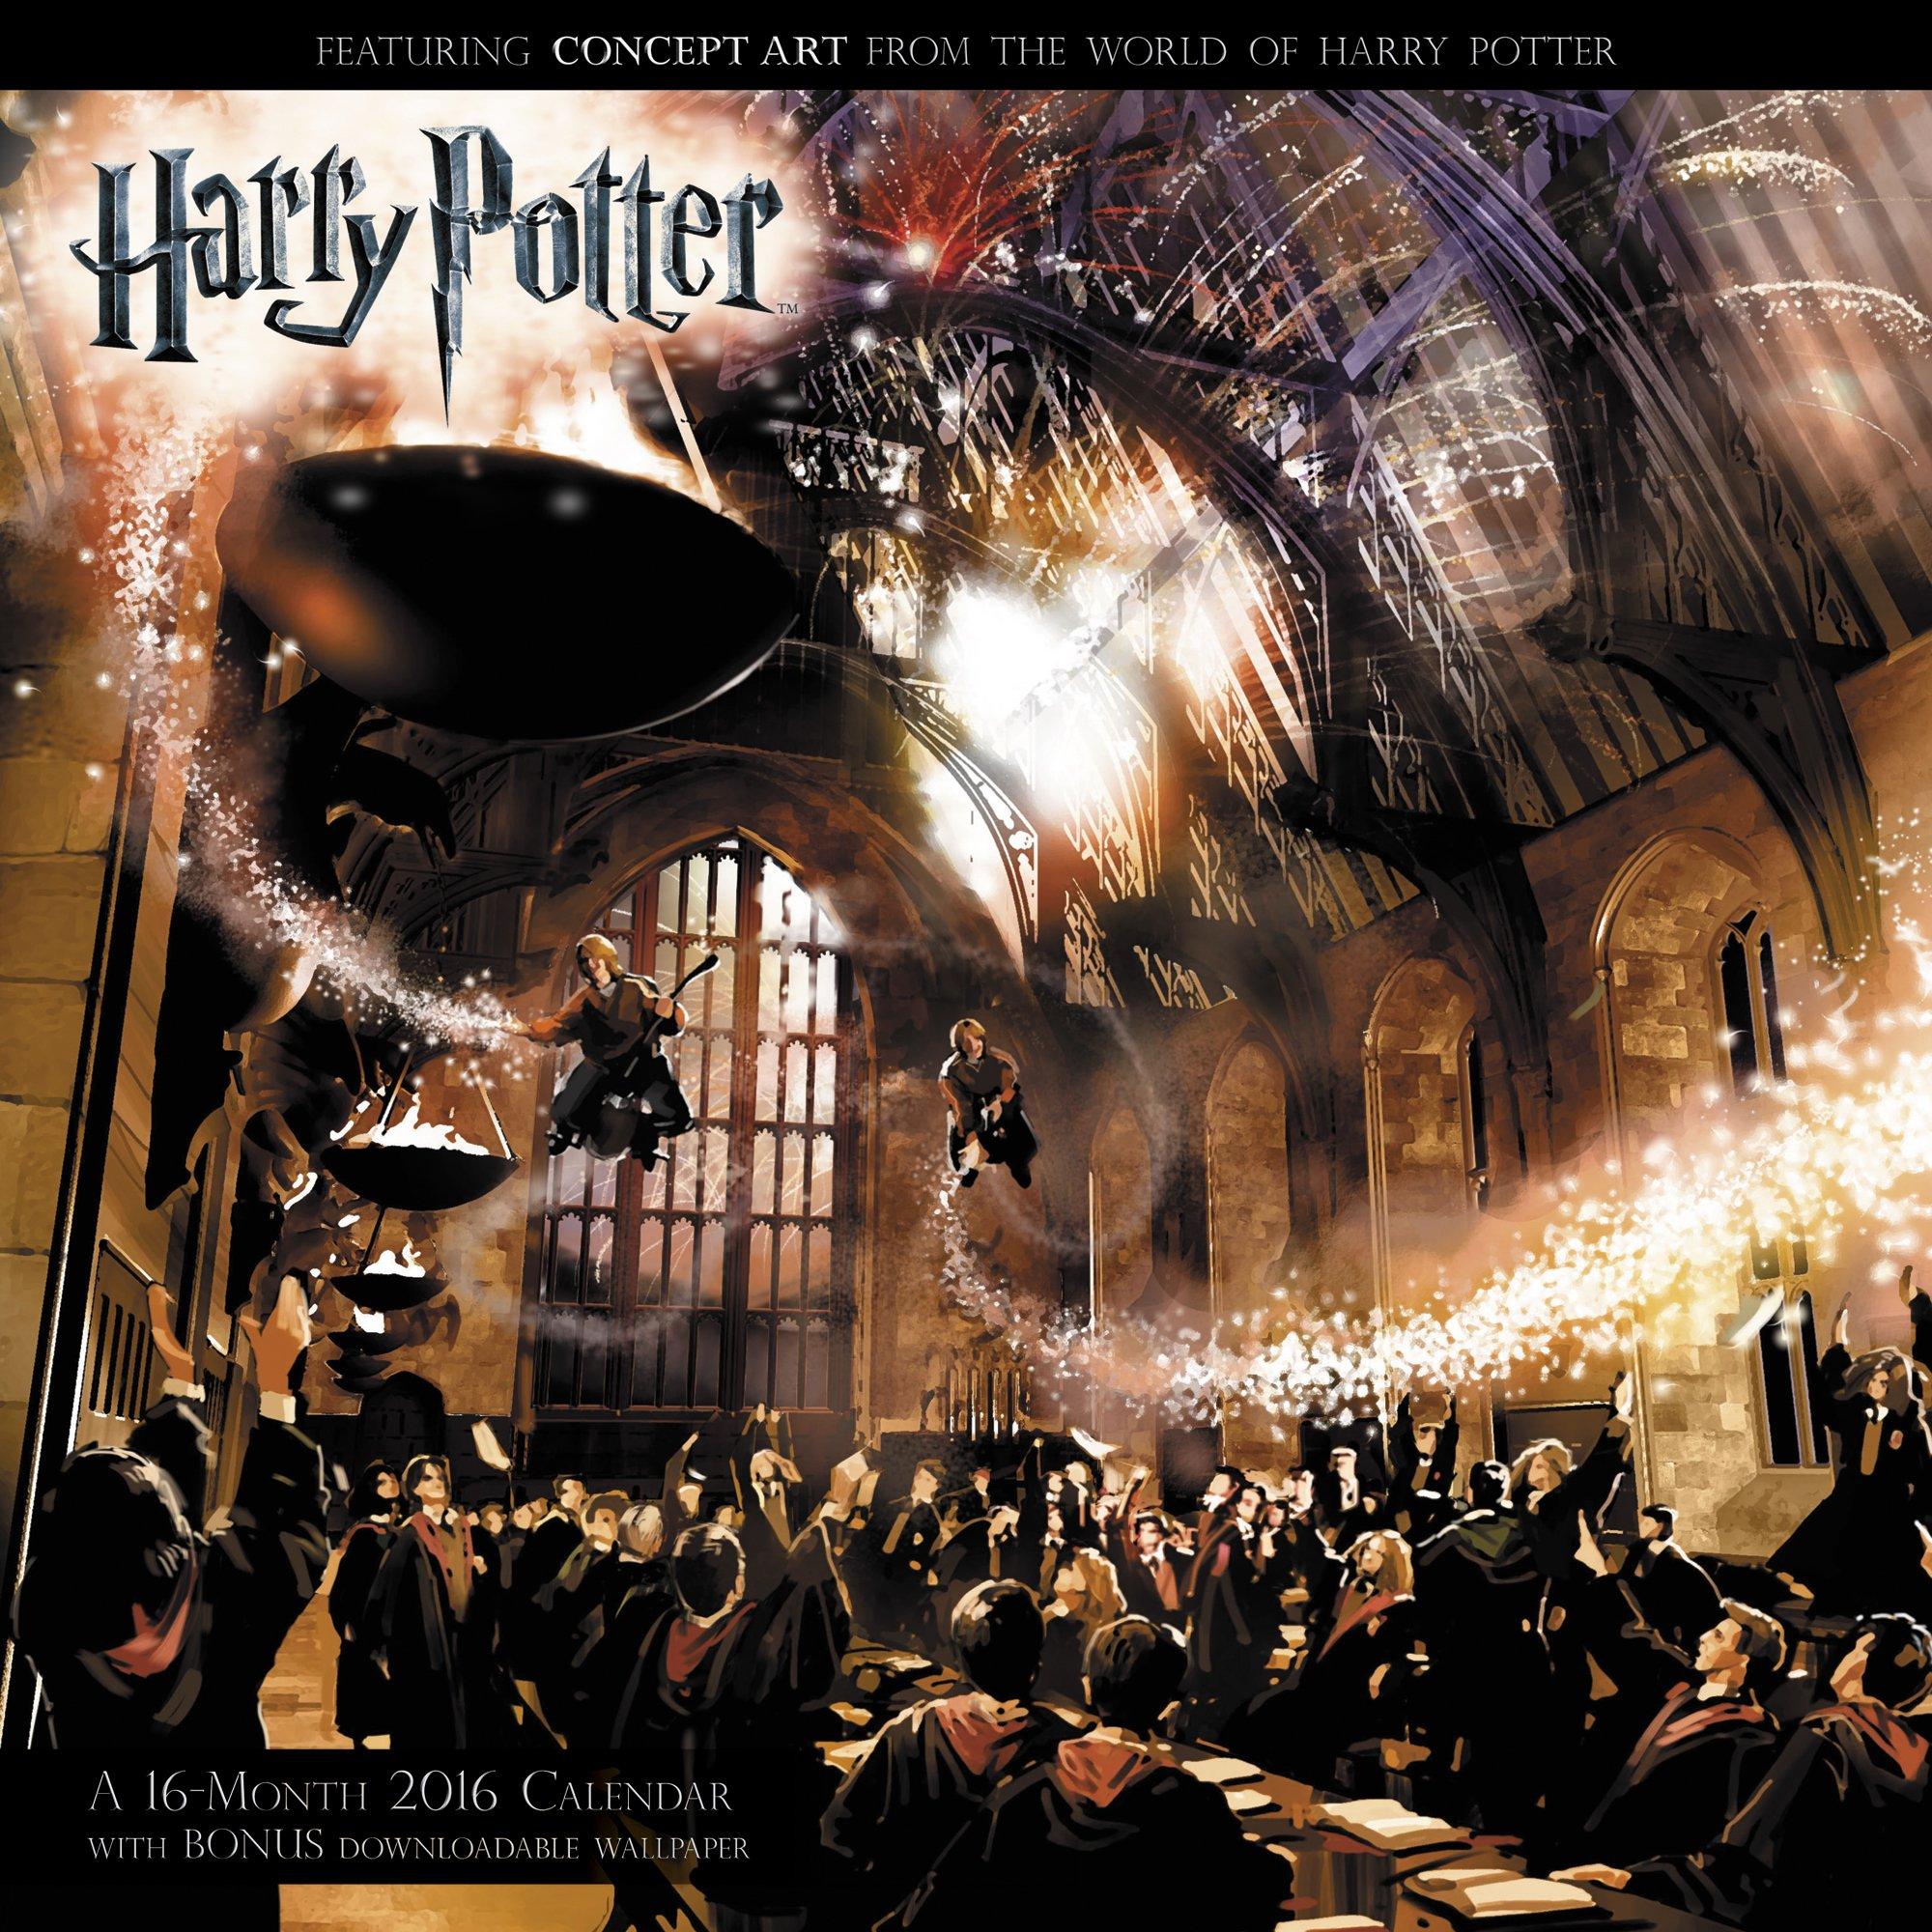 Good Wallpaper Harry Potter Concept Art - 91NUkFK%2BEpL  You Should Have_279434.jpg